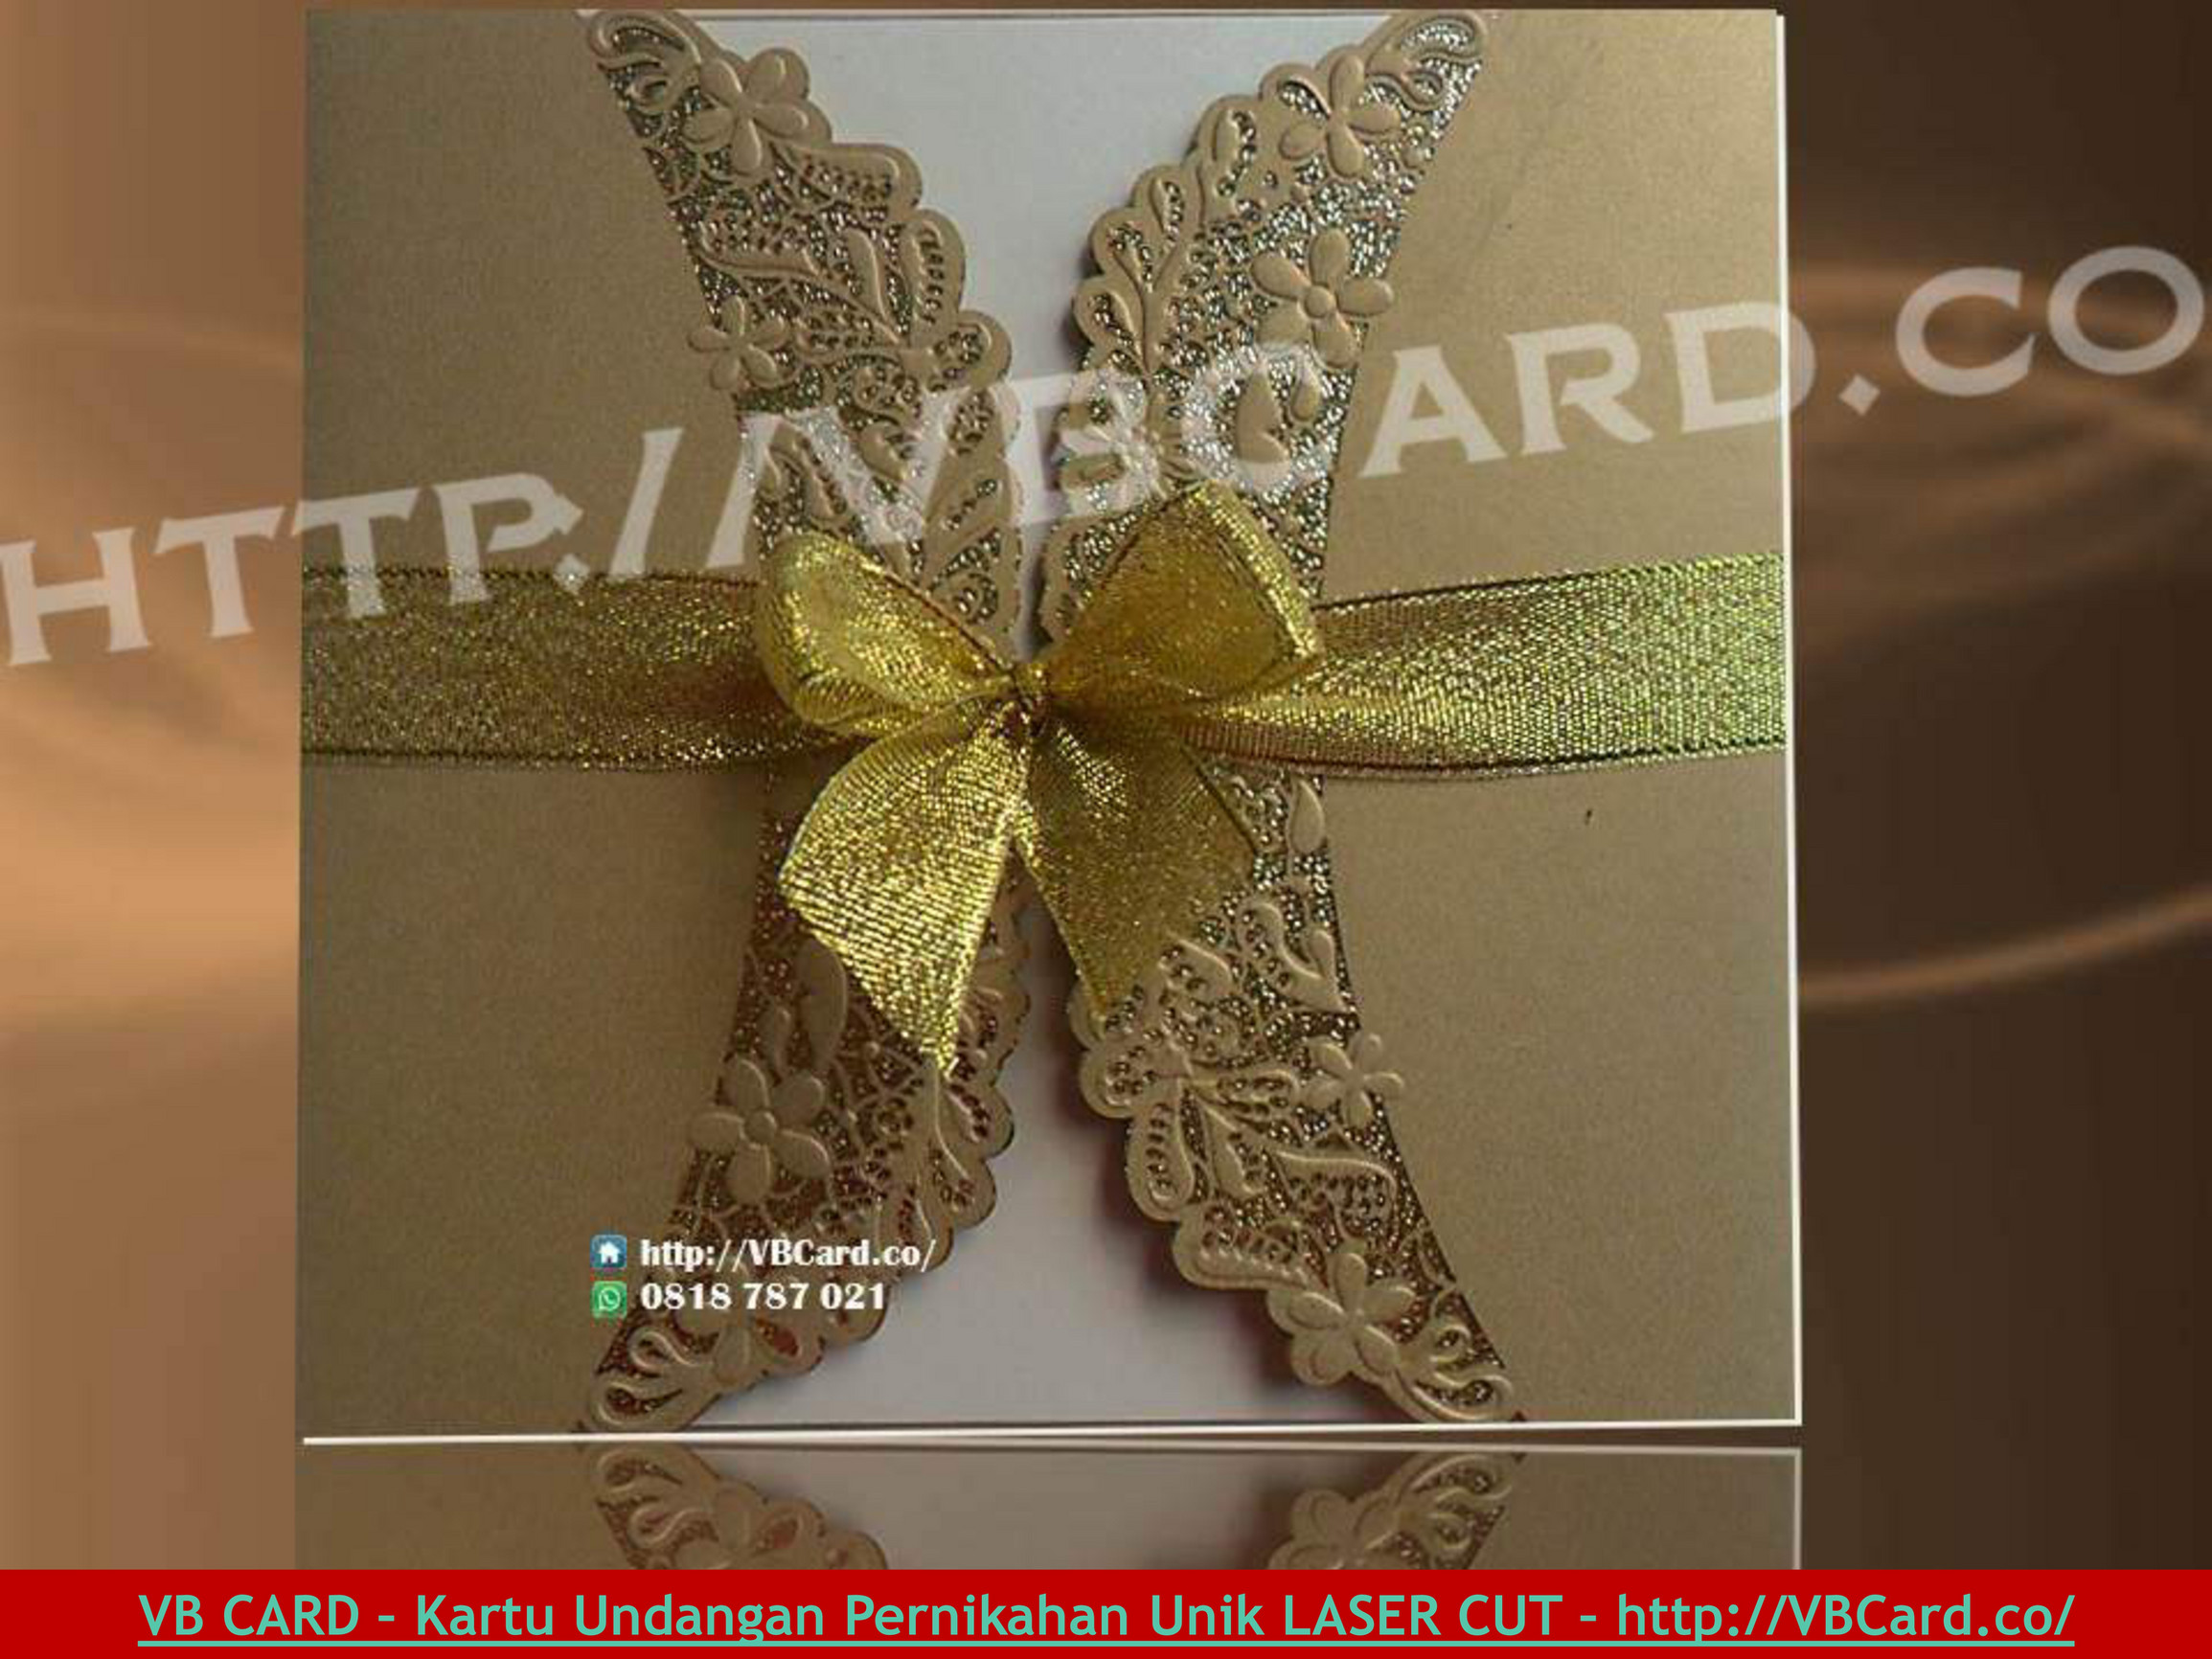 My Publications Kartu Undangan Pernikahan Unik Elegan Laser Cutting Jakarta Vb Card Page 14 15 Created With Publitas Com